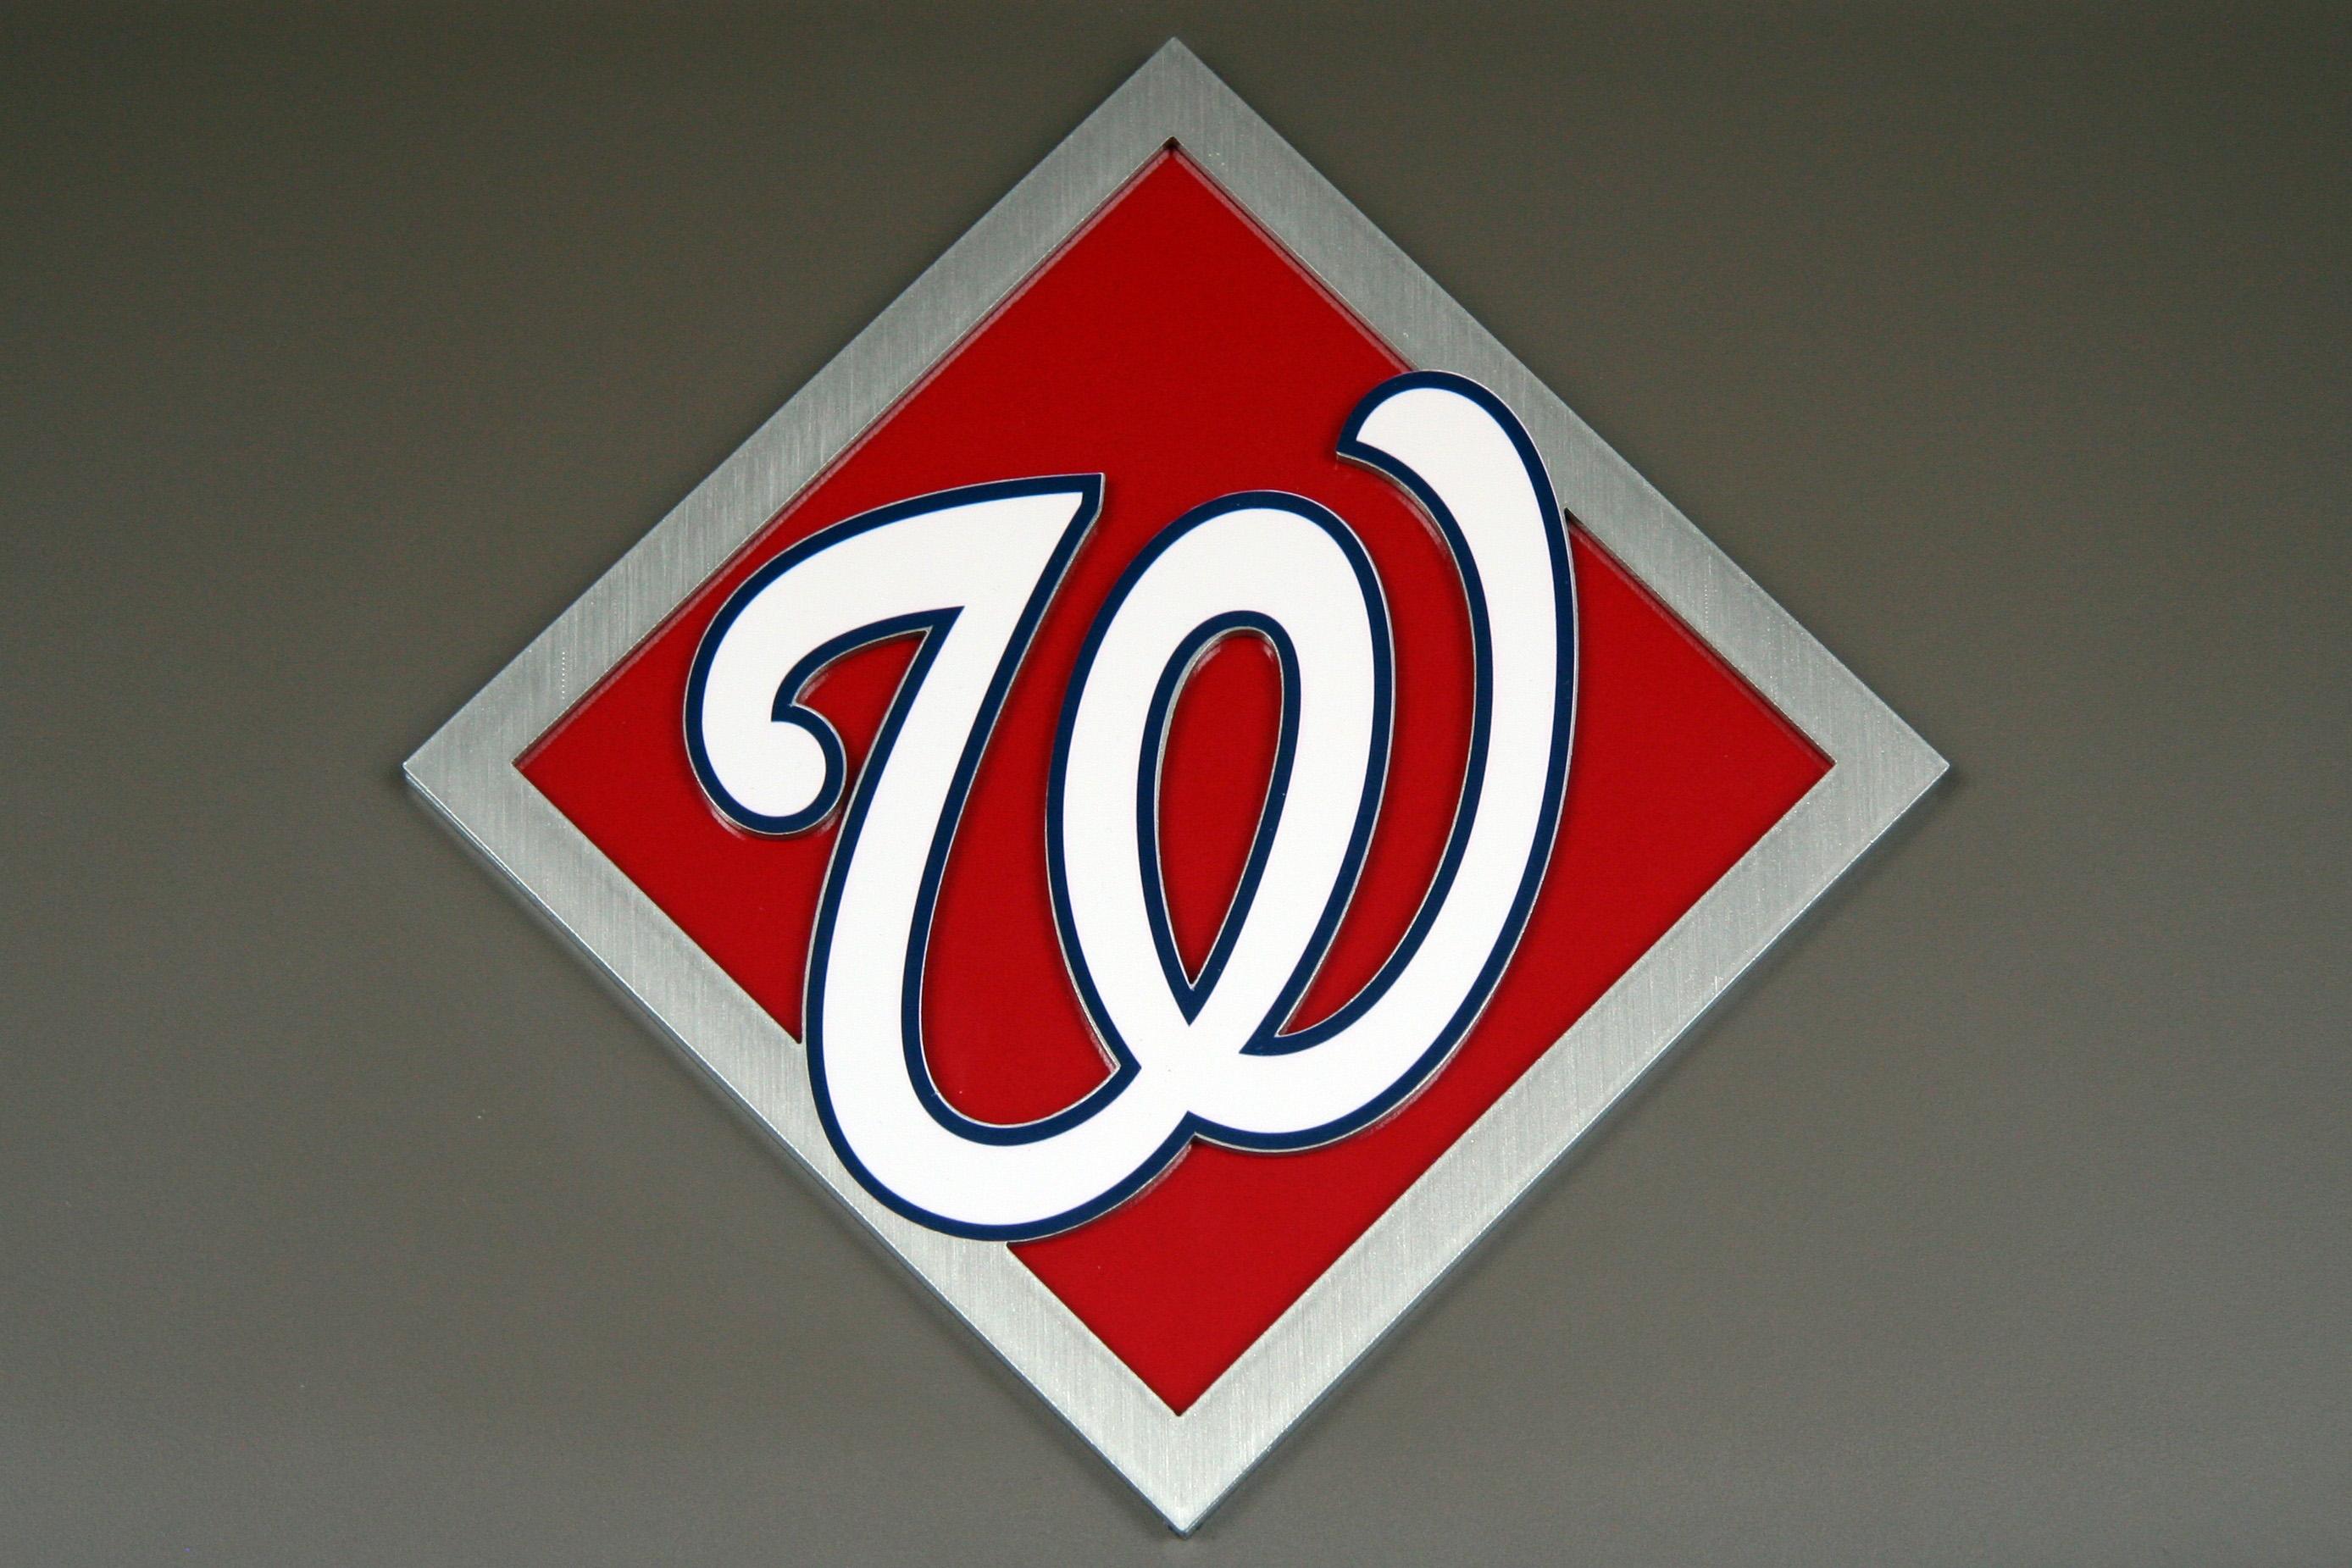 WASHINGTON NATIONALS mlb baseball 34 wallpaper background 2776x1851